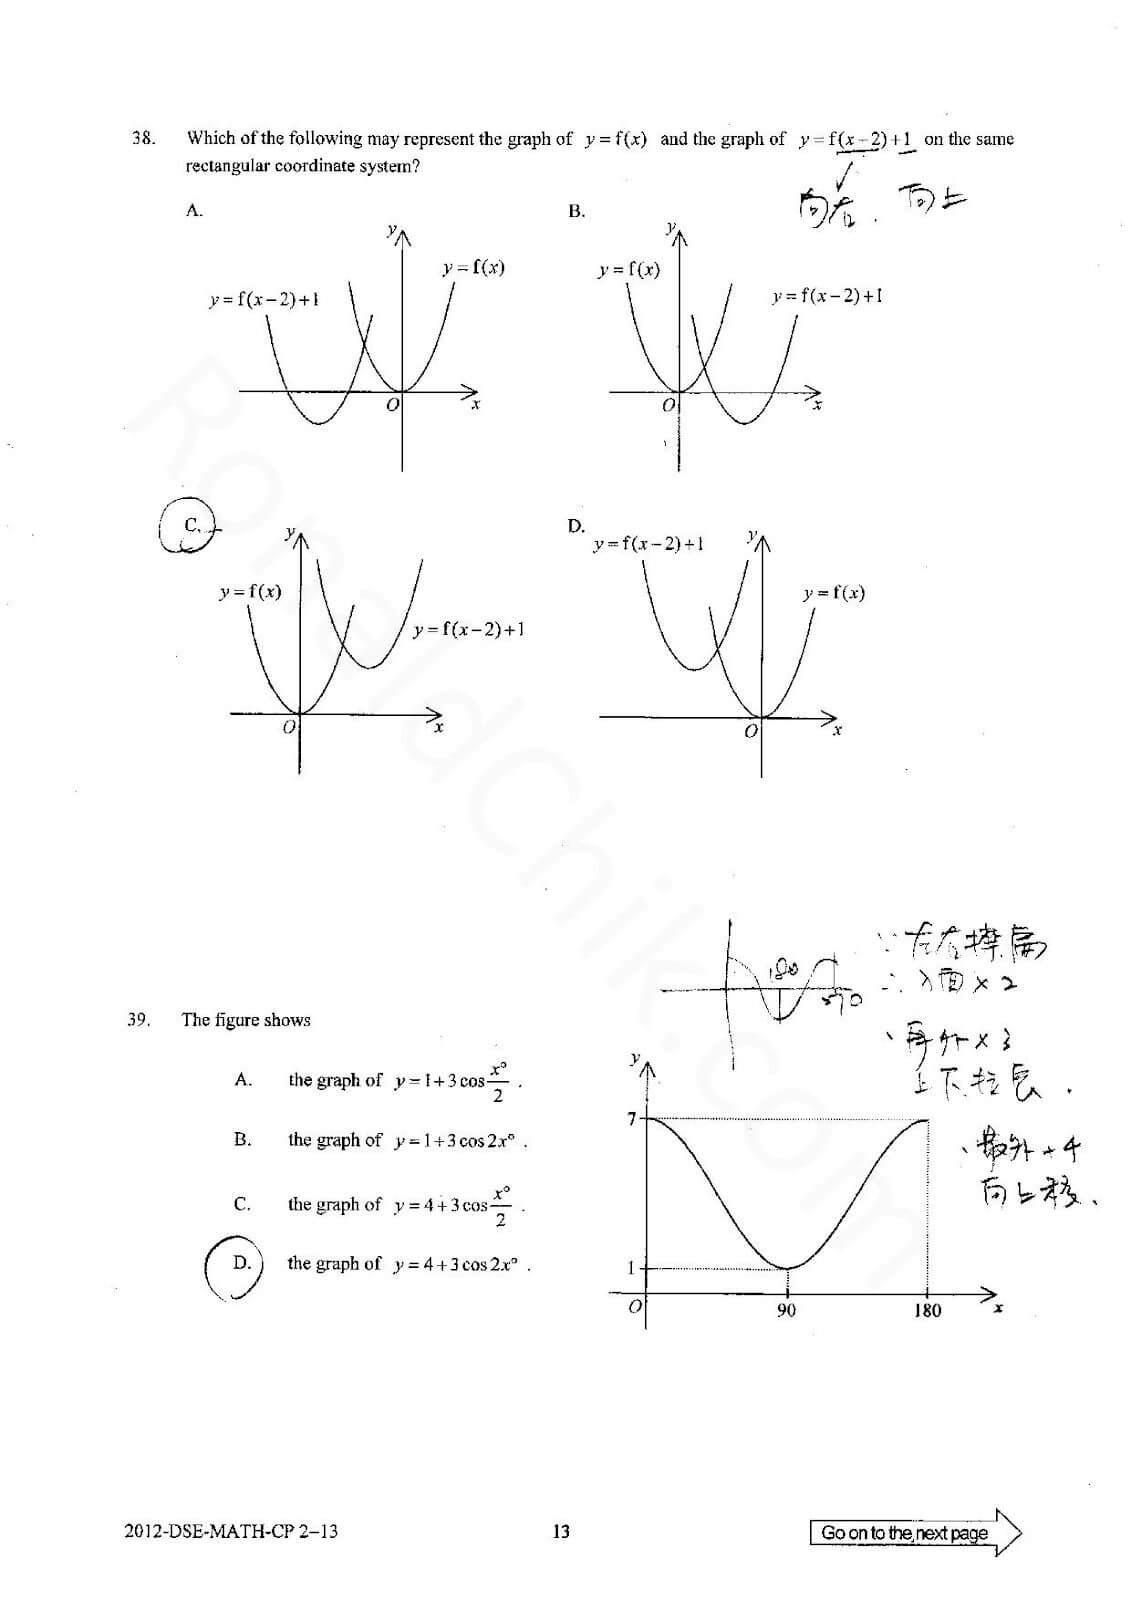 2012 DSE Math P2 卷二 Q38,39